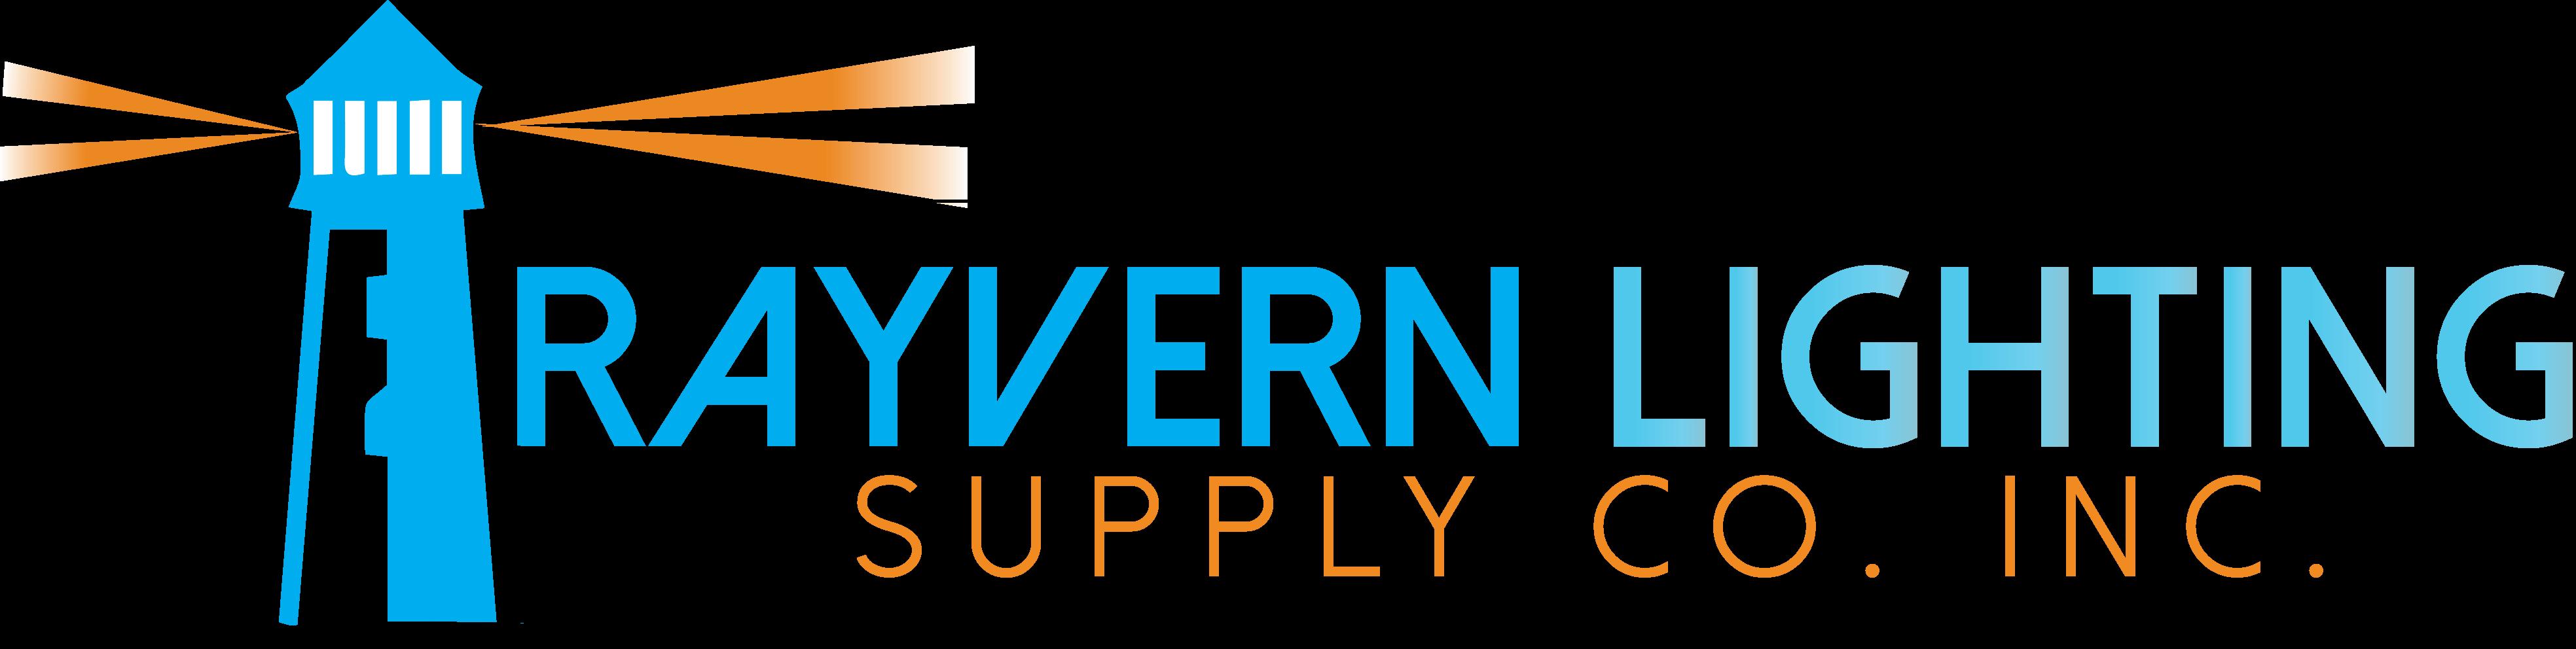 rayvern.com